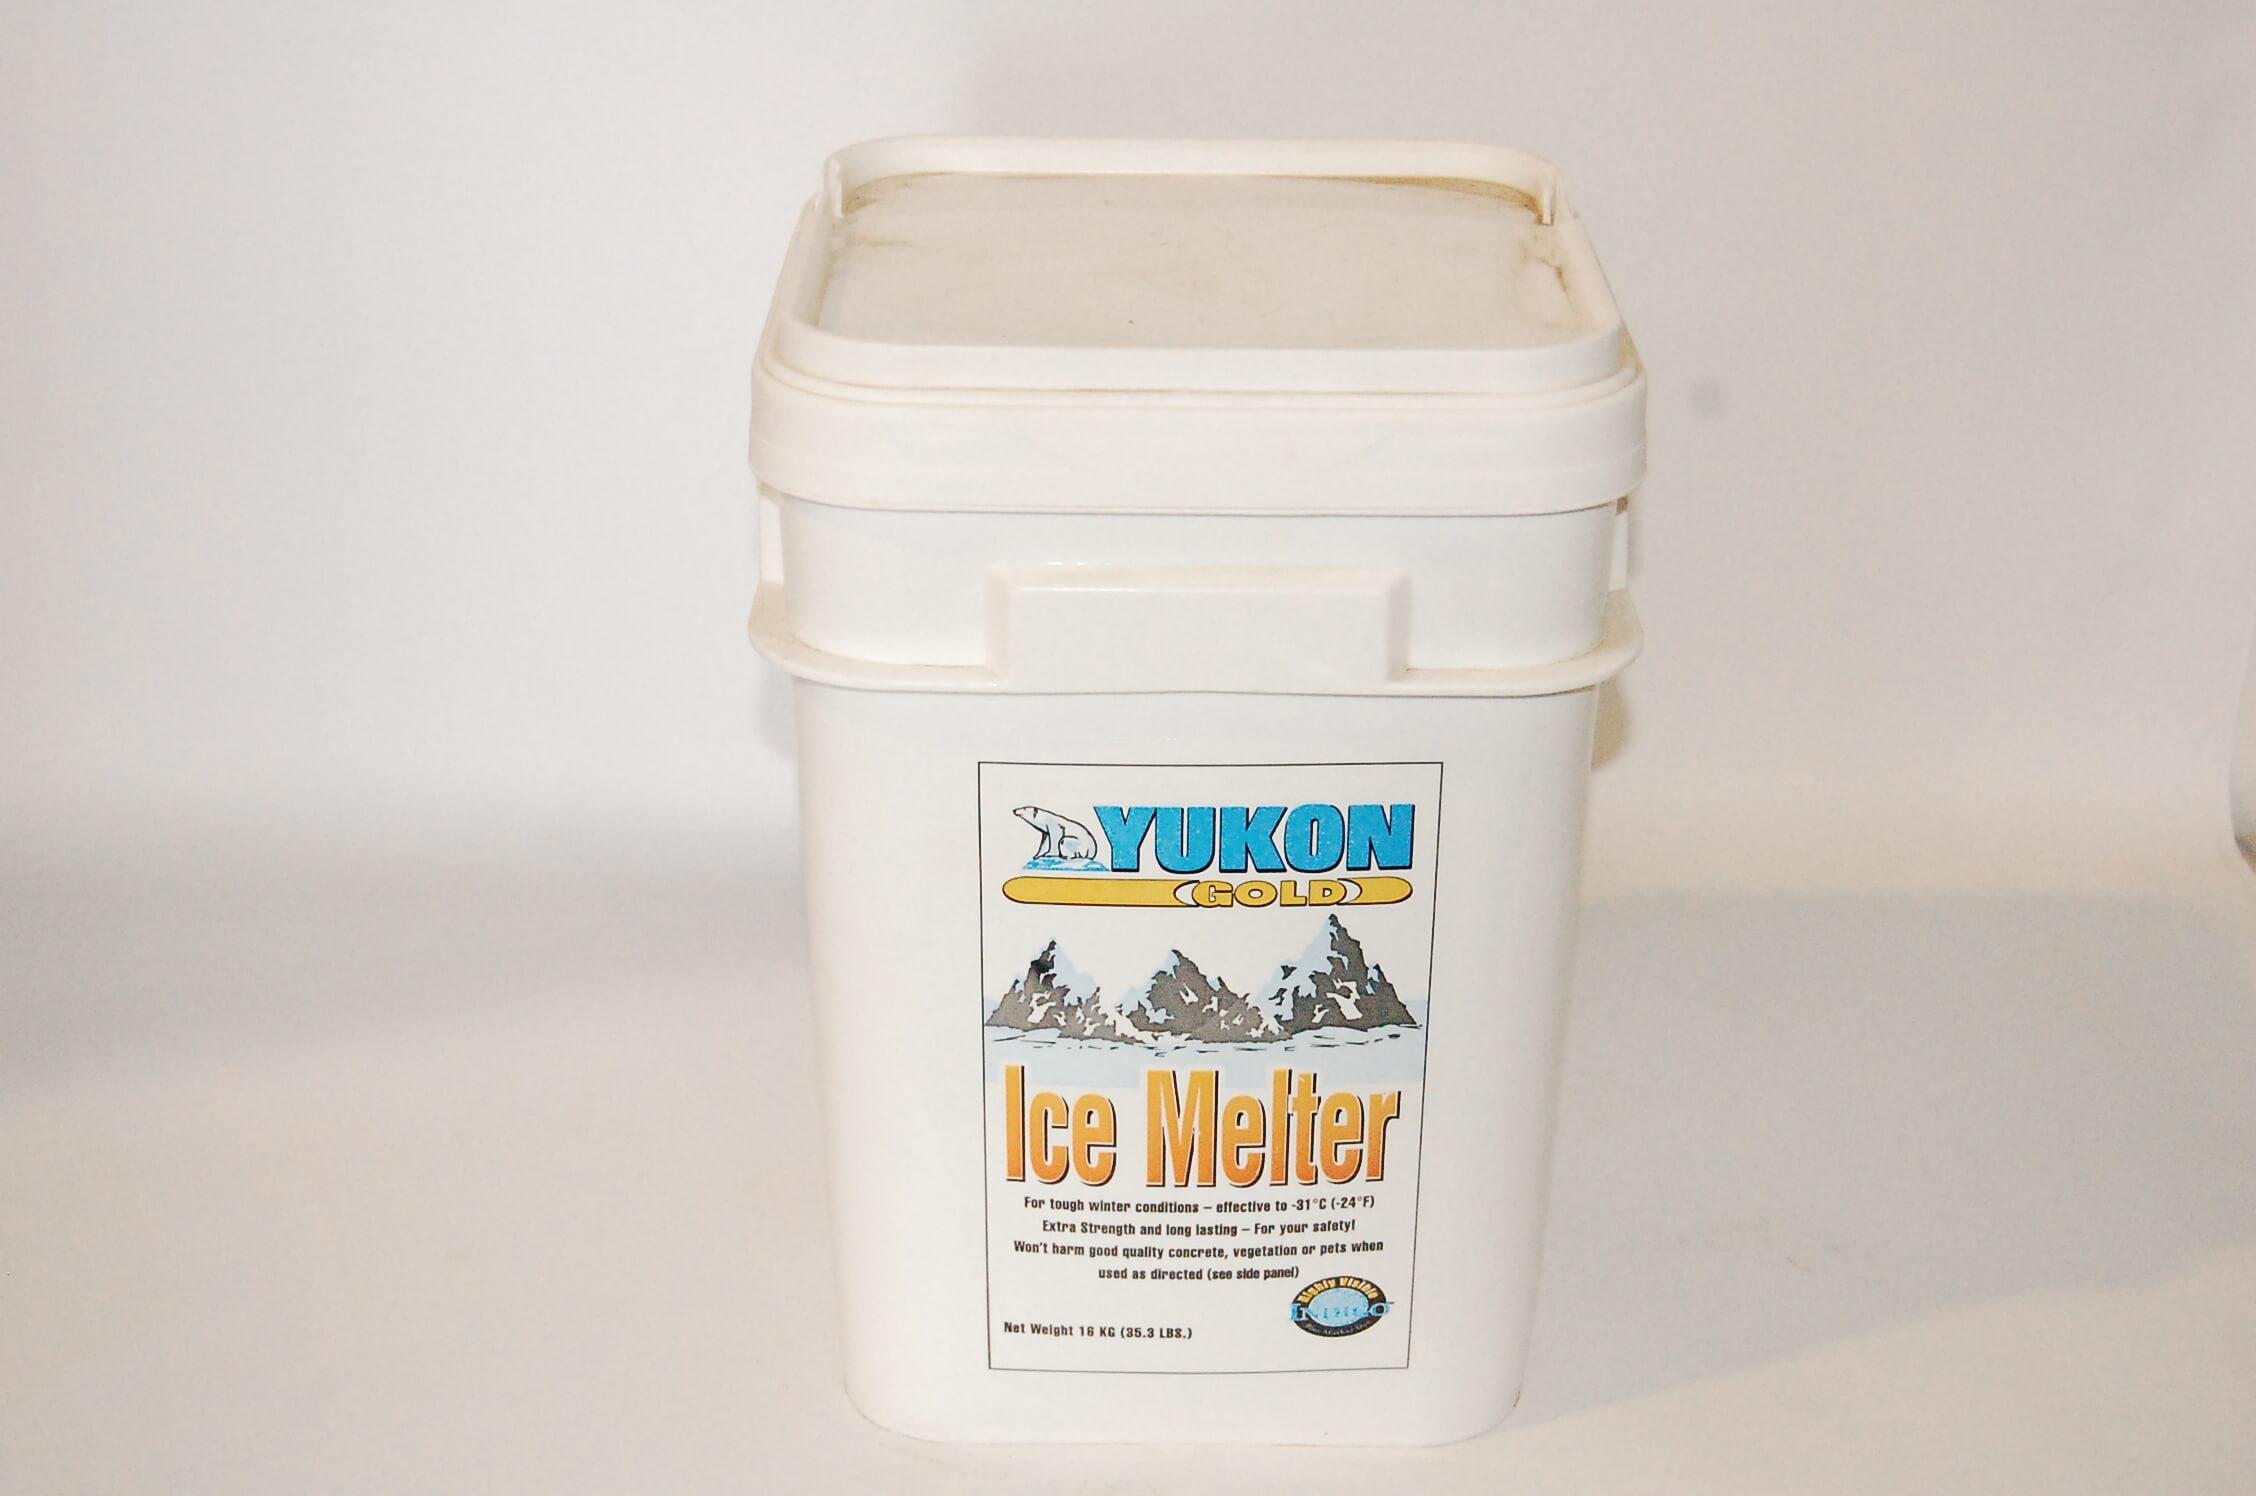 Yukon Gold Ice Melt (16 kg pail)